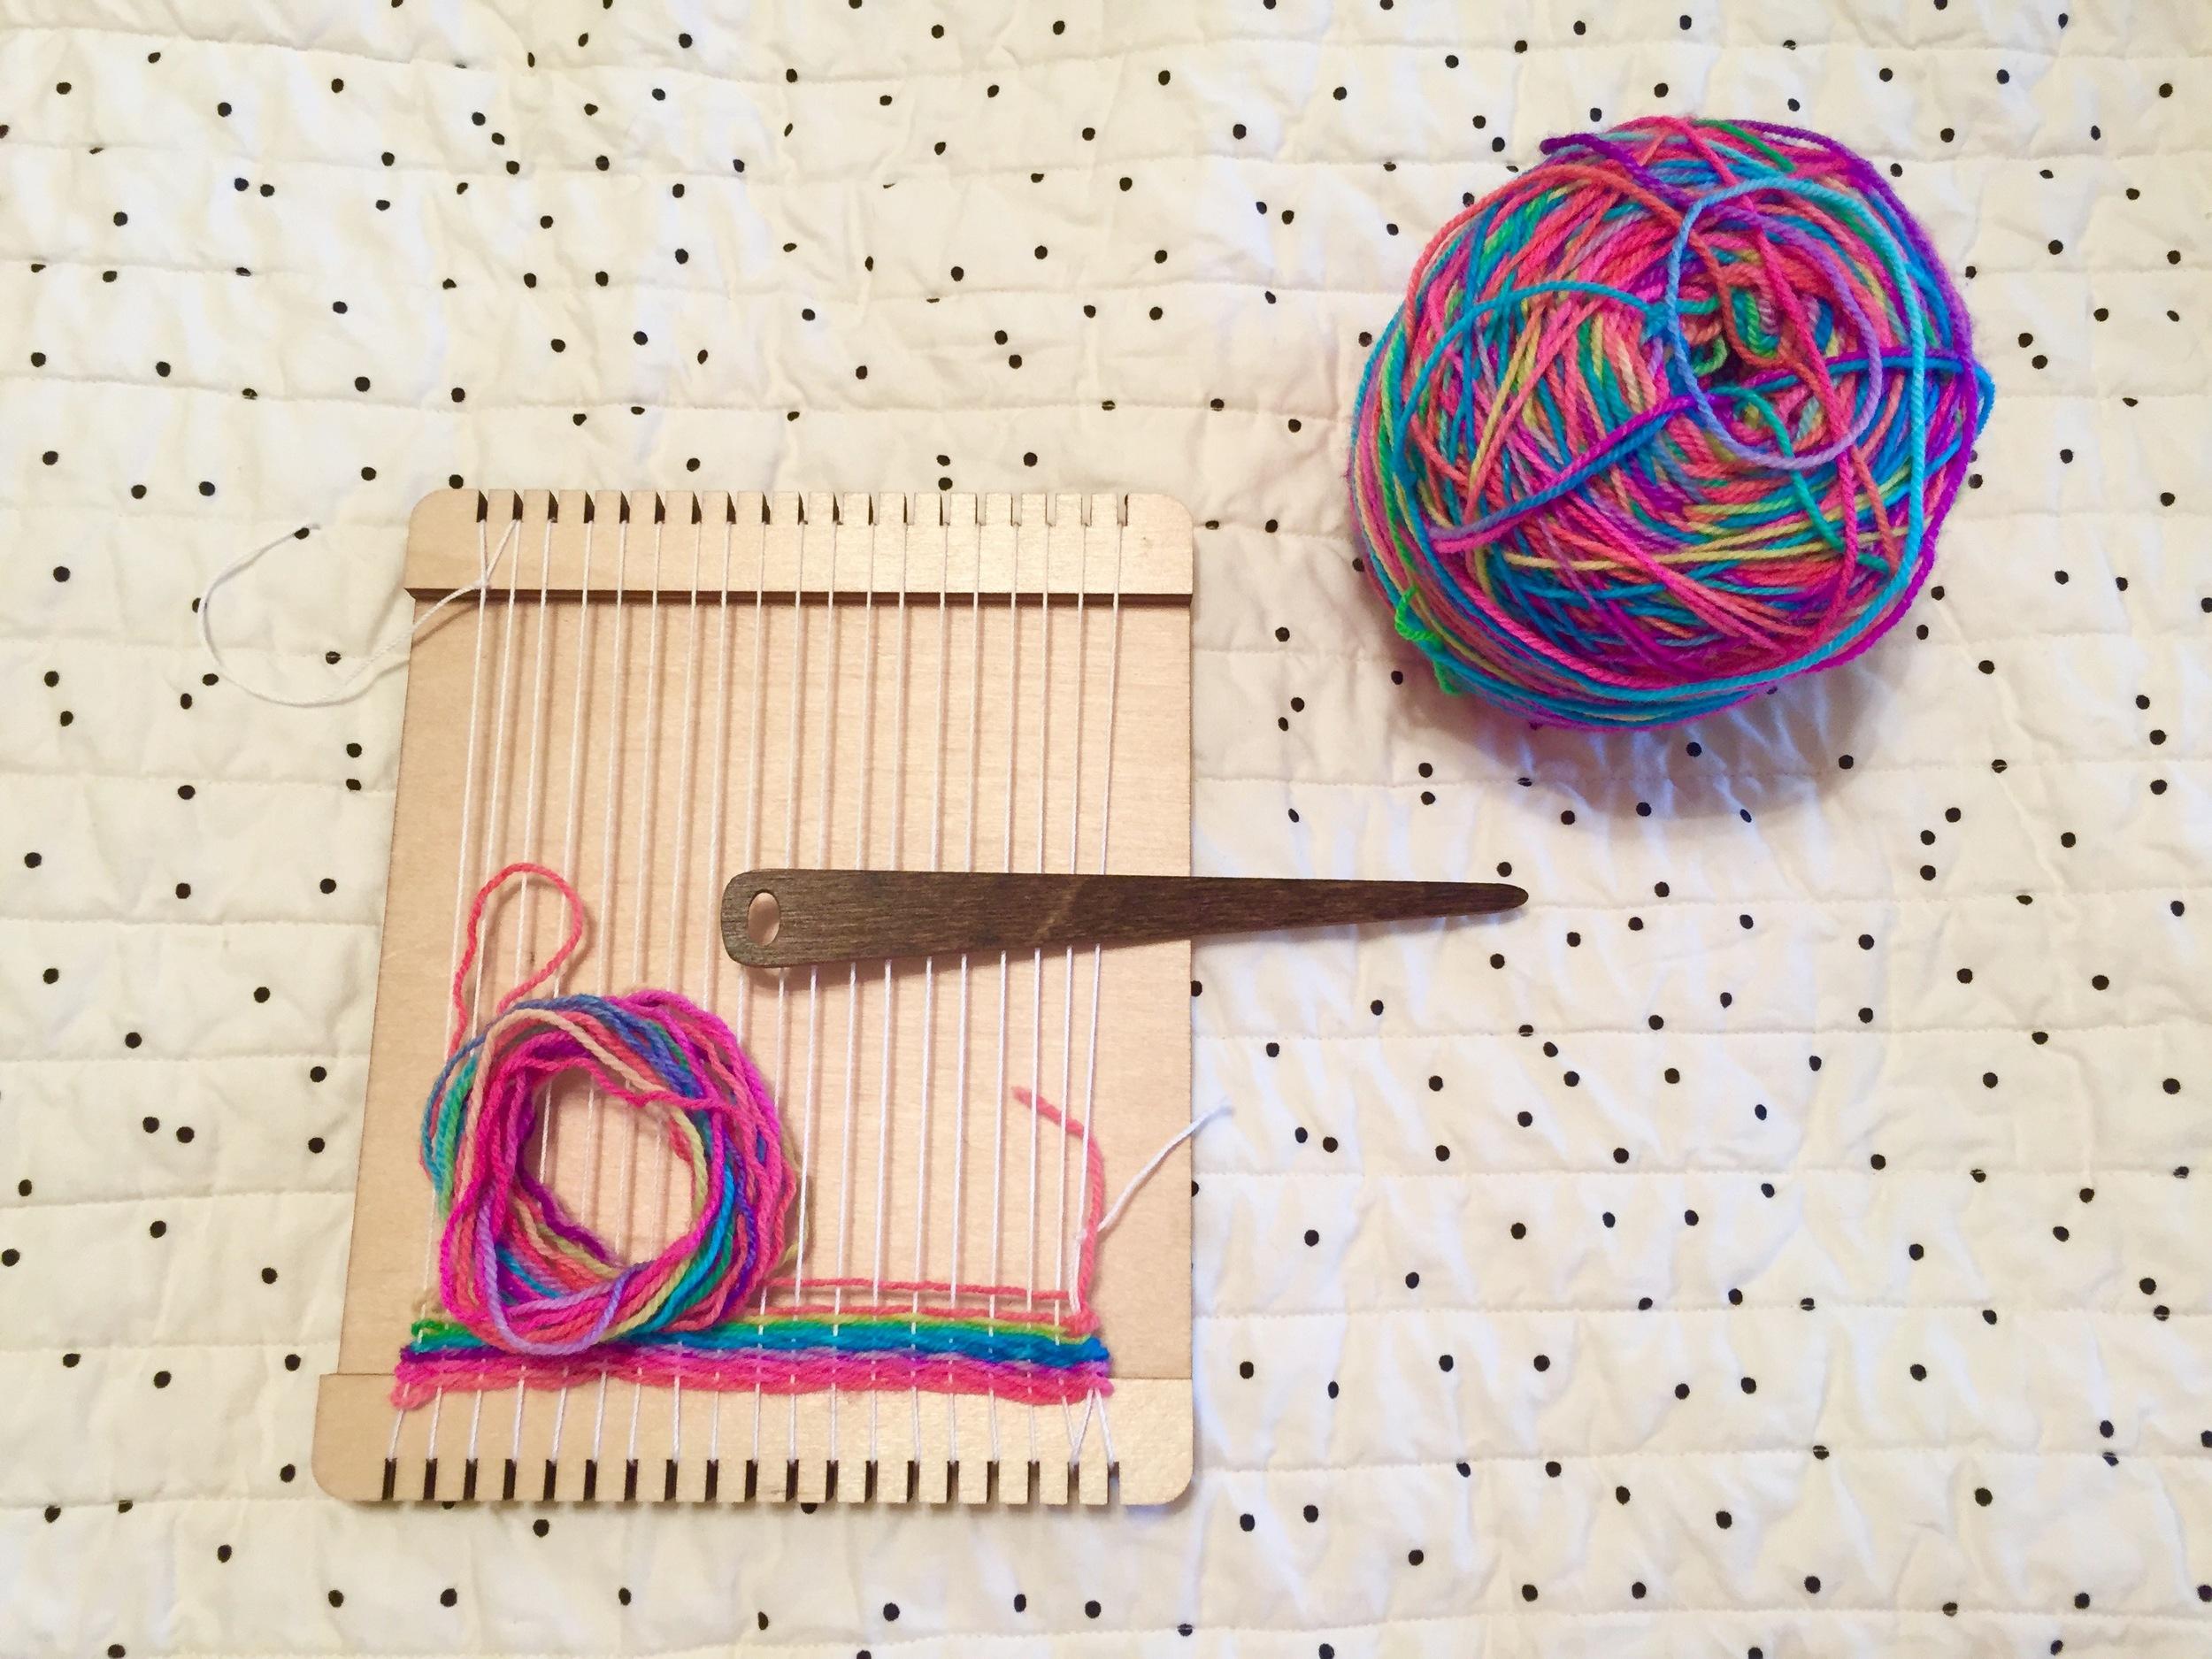 My new rainbow weaving.